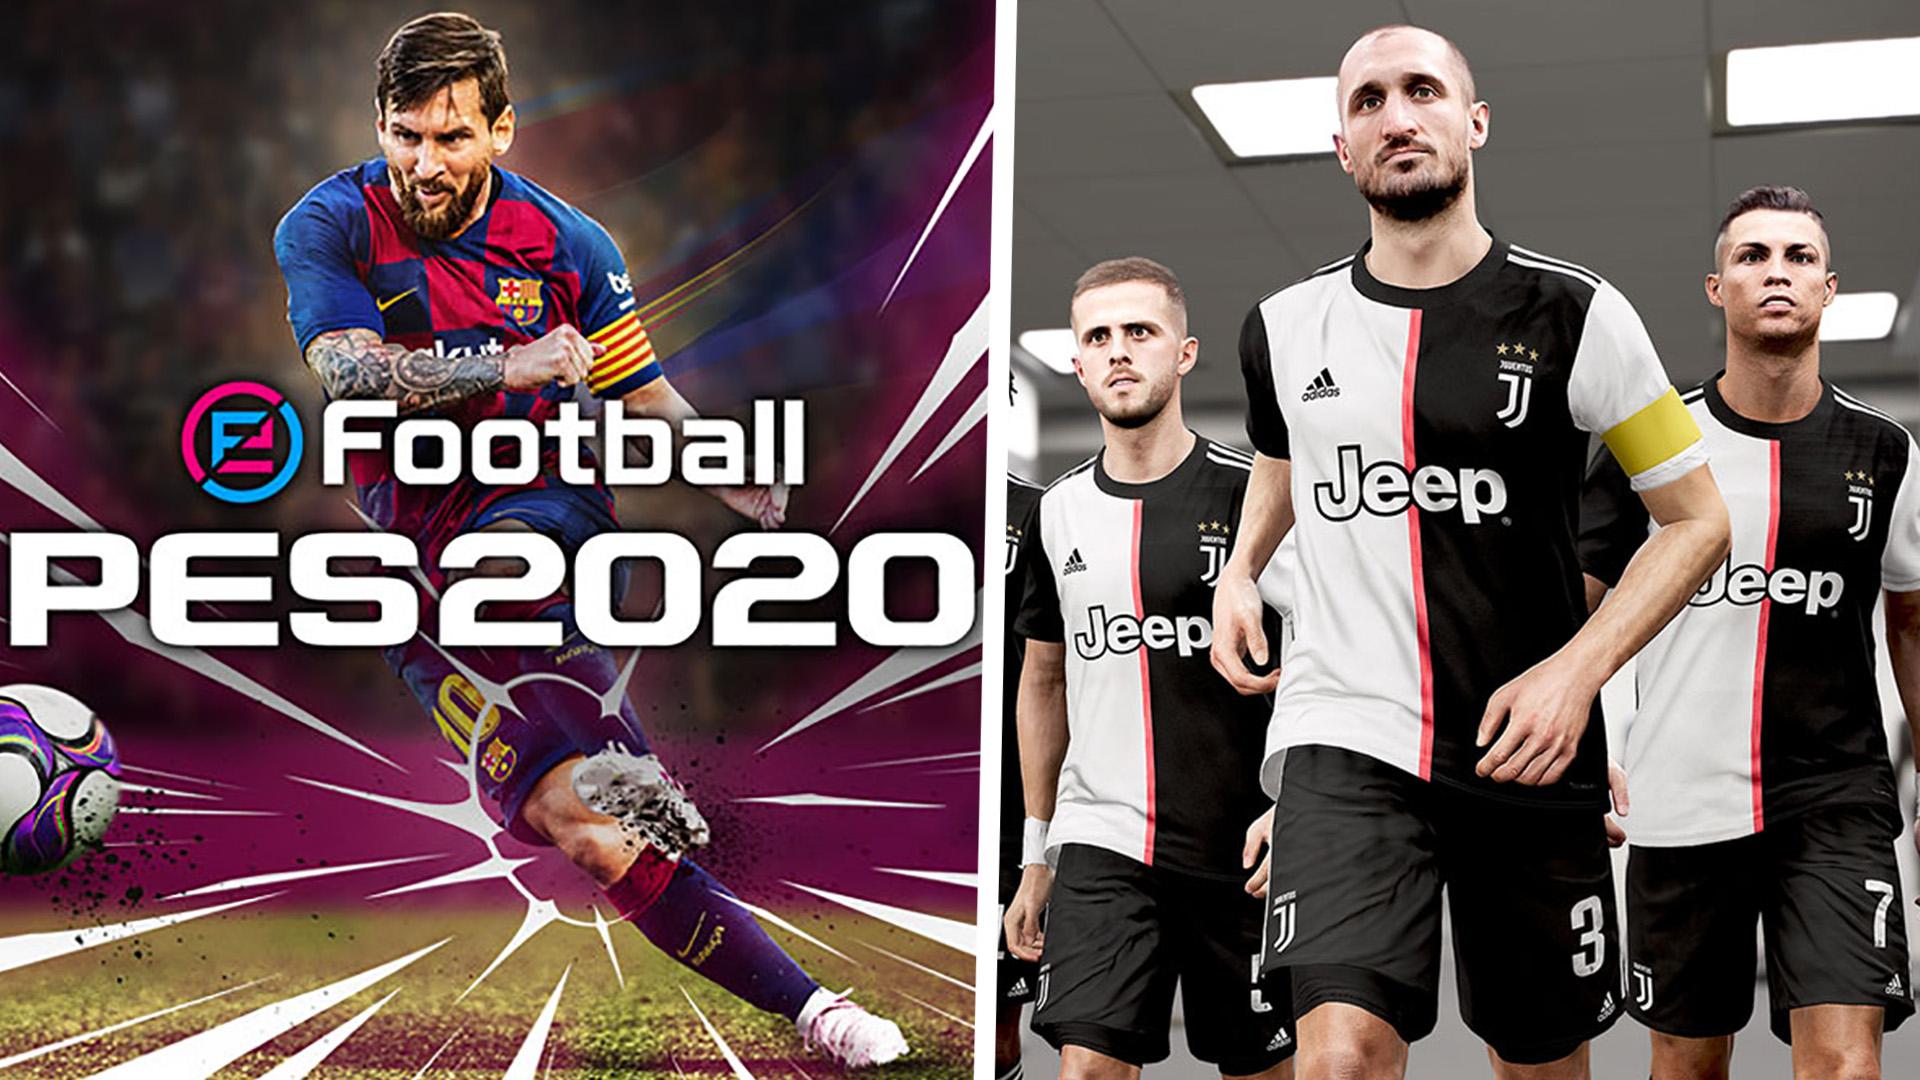 Pes 2020 Release Date Demo Licenses Cover Stars All The New Pro Evolution Soccer Details Goal Com